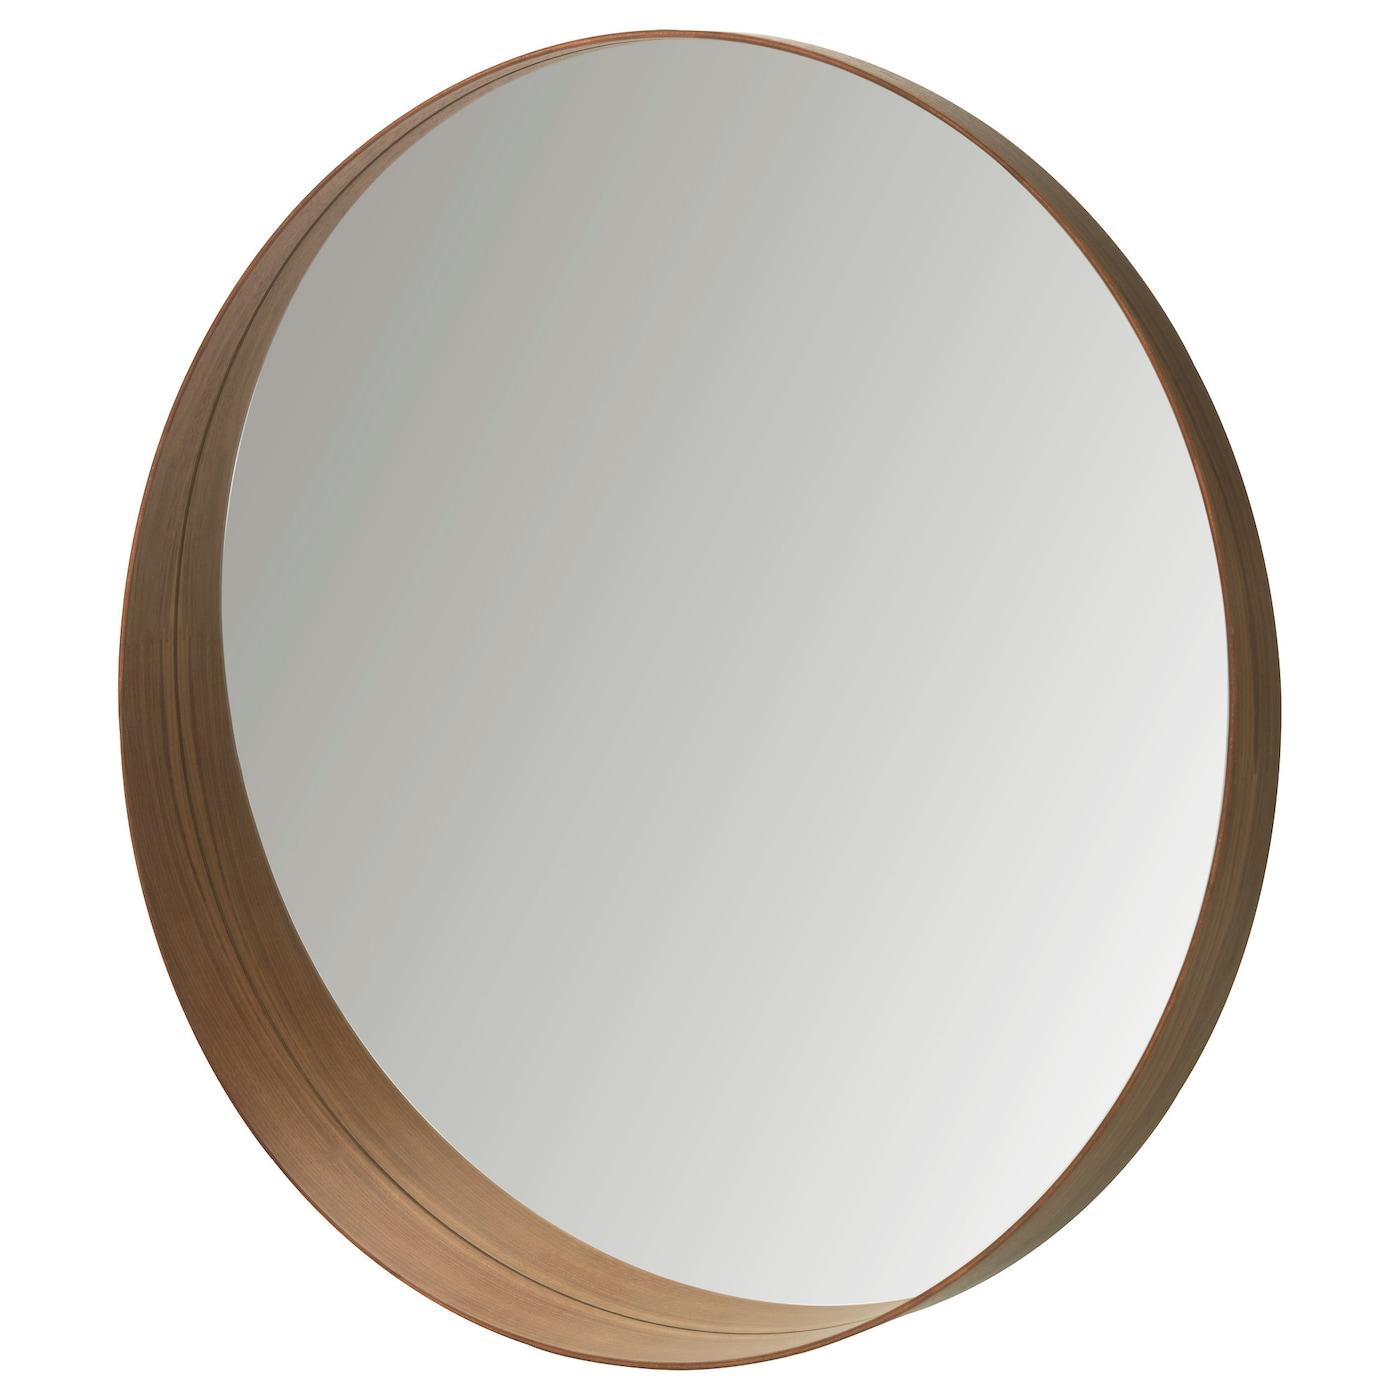 Miroir Ovale Salle De Bain Ikea ~ stockholm miroir plaqu noyer 80 cm ikea